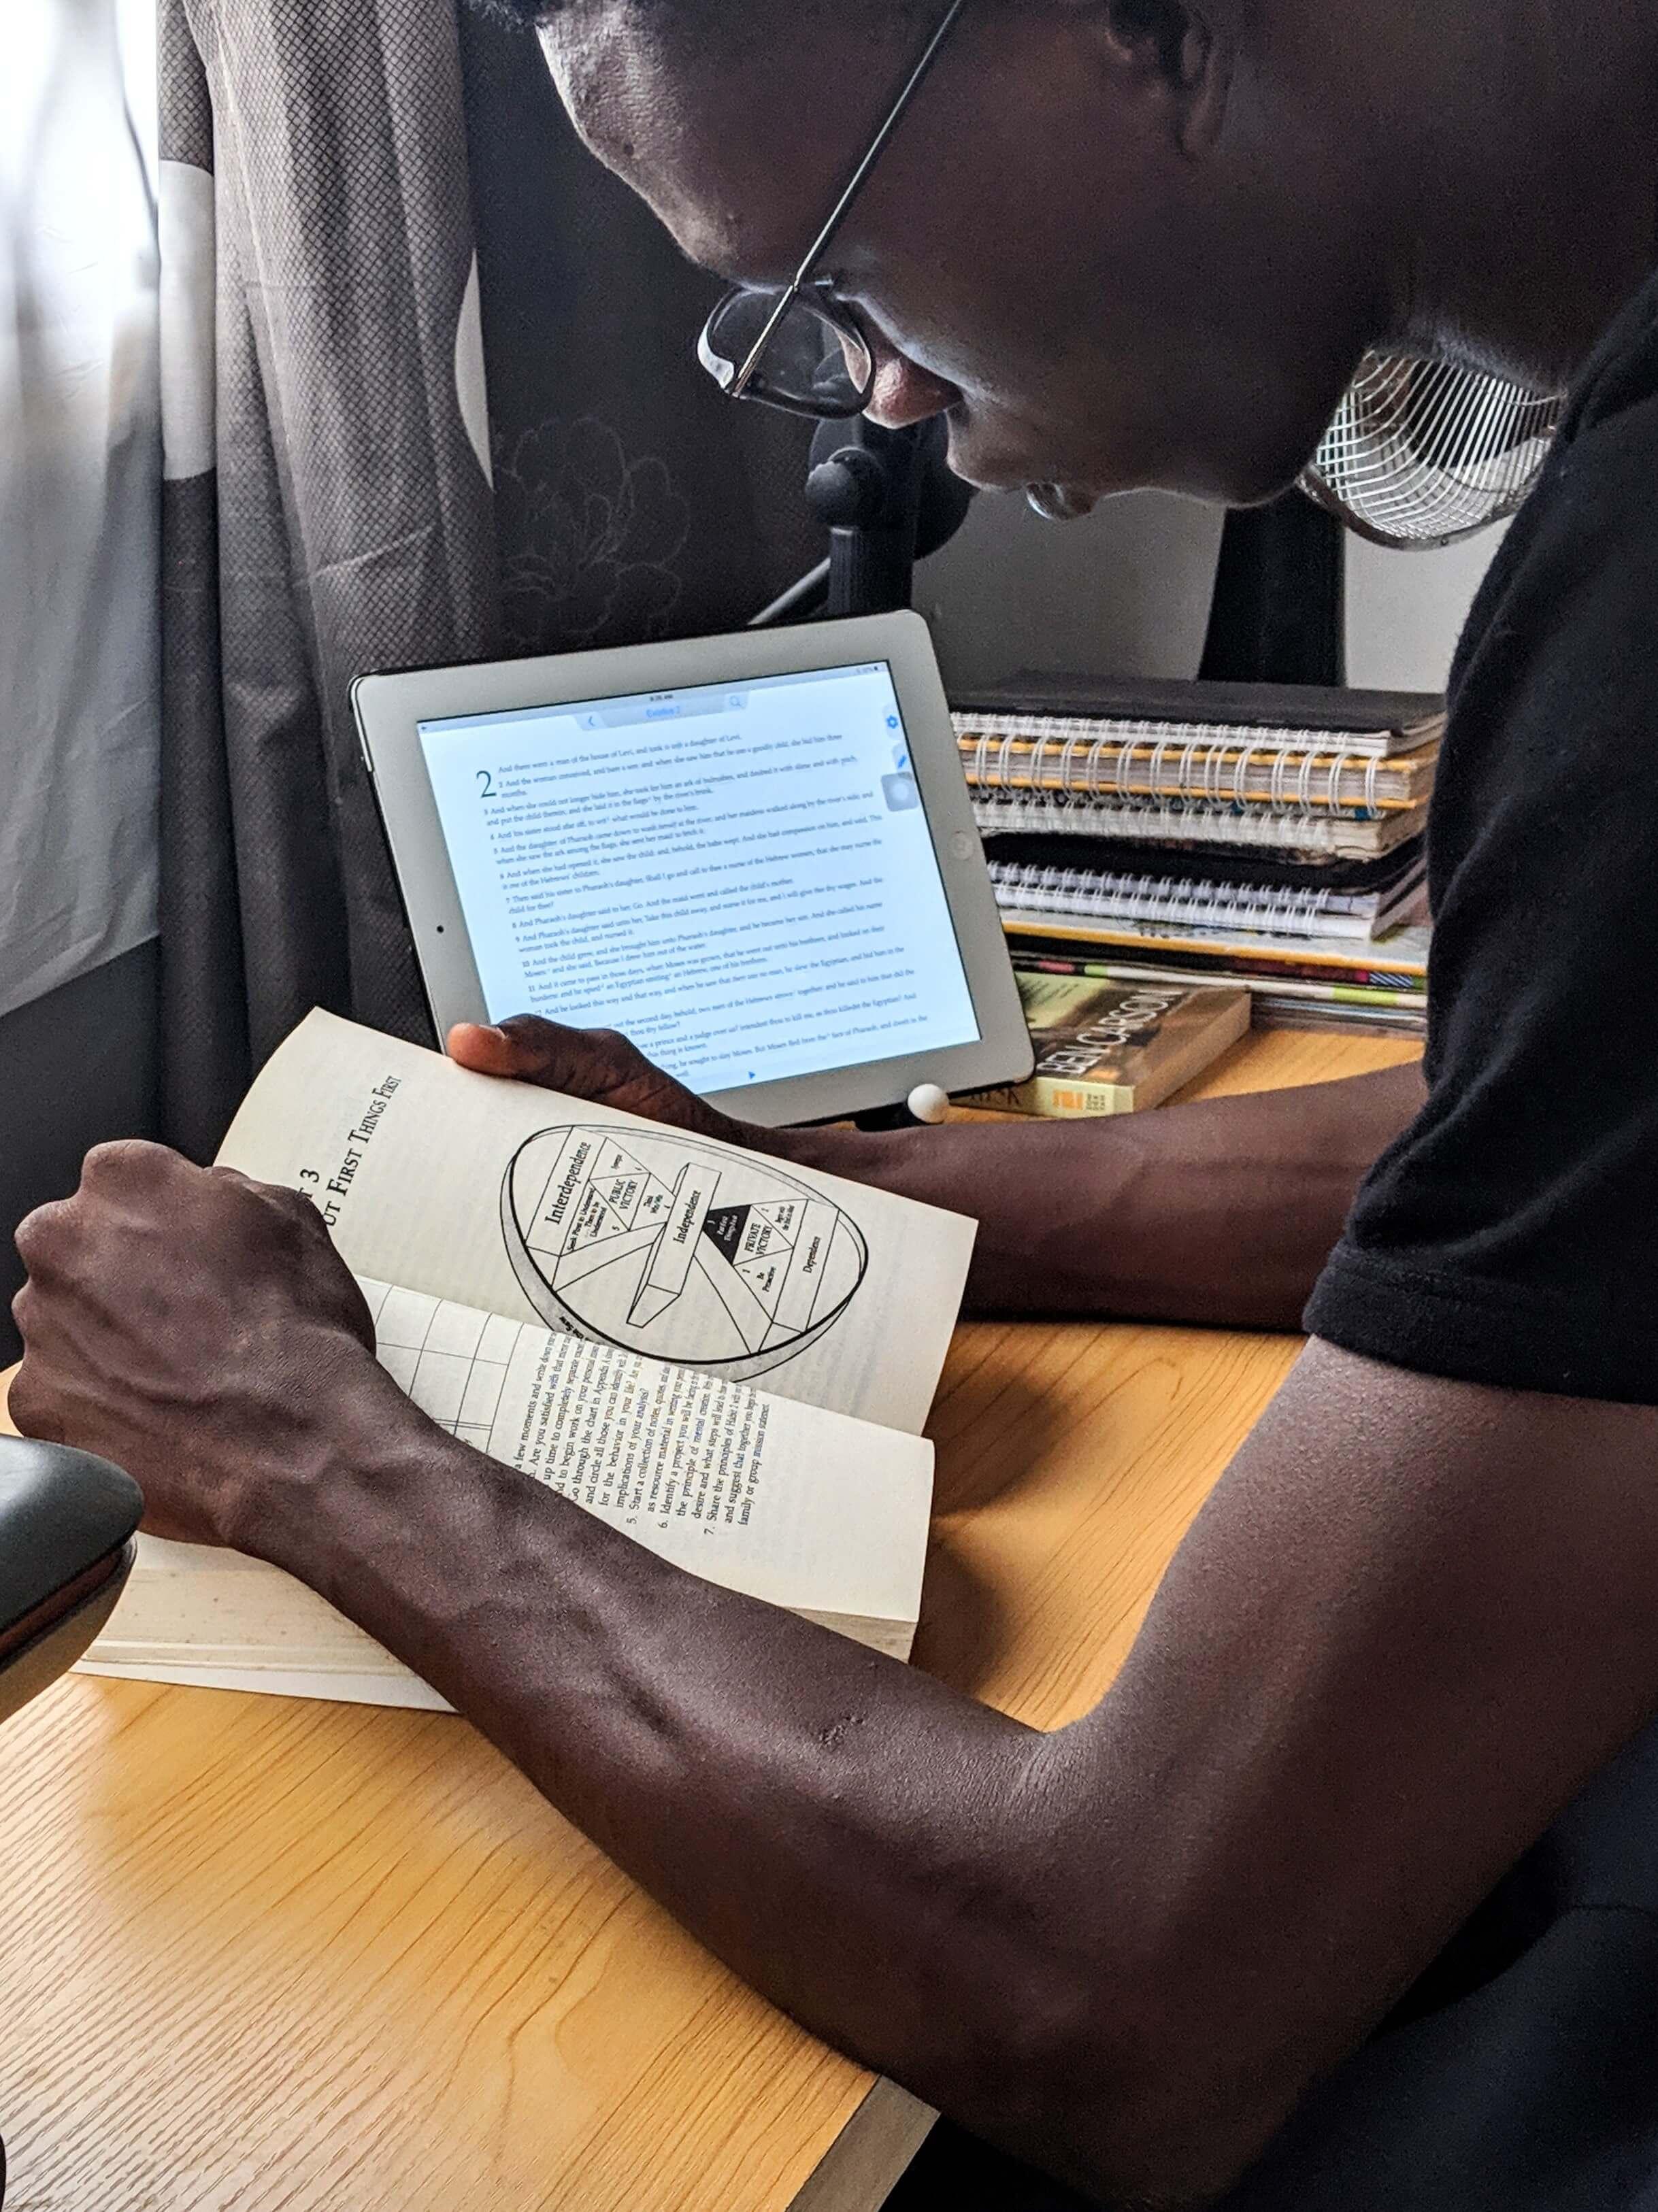 ucpel-estudos-alunos-lendo